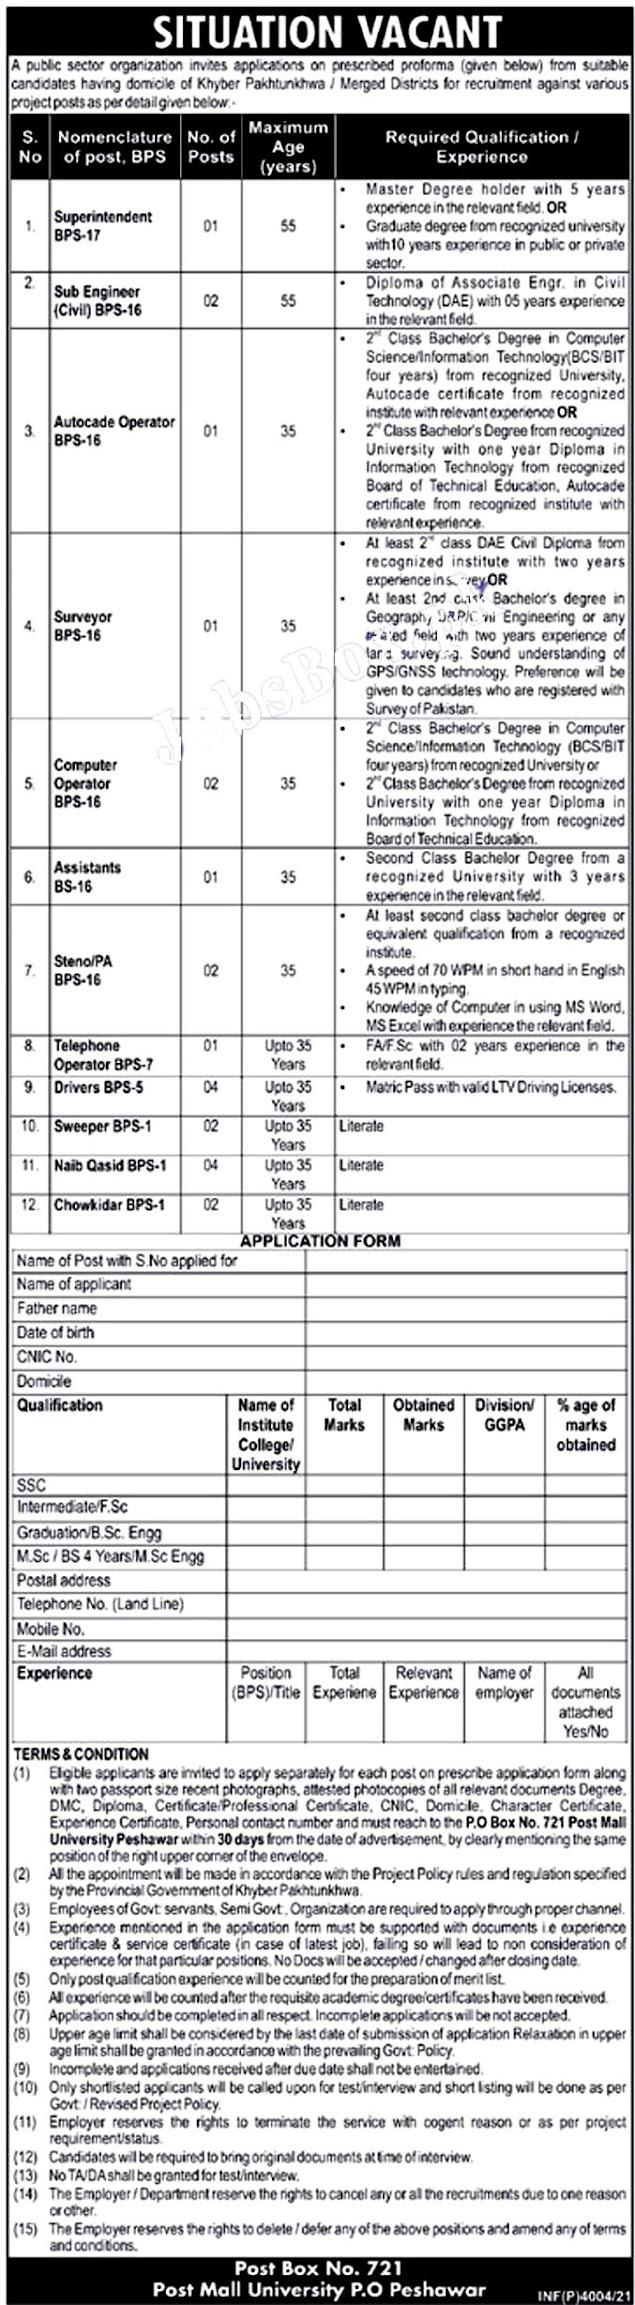 Public Sector Organization Latest Jobs 2021 – PO Box No 741 Peshawar Latest Jobs- Download  Application Form